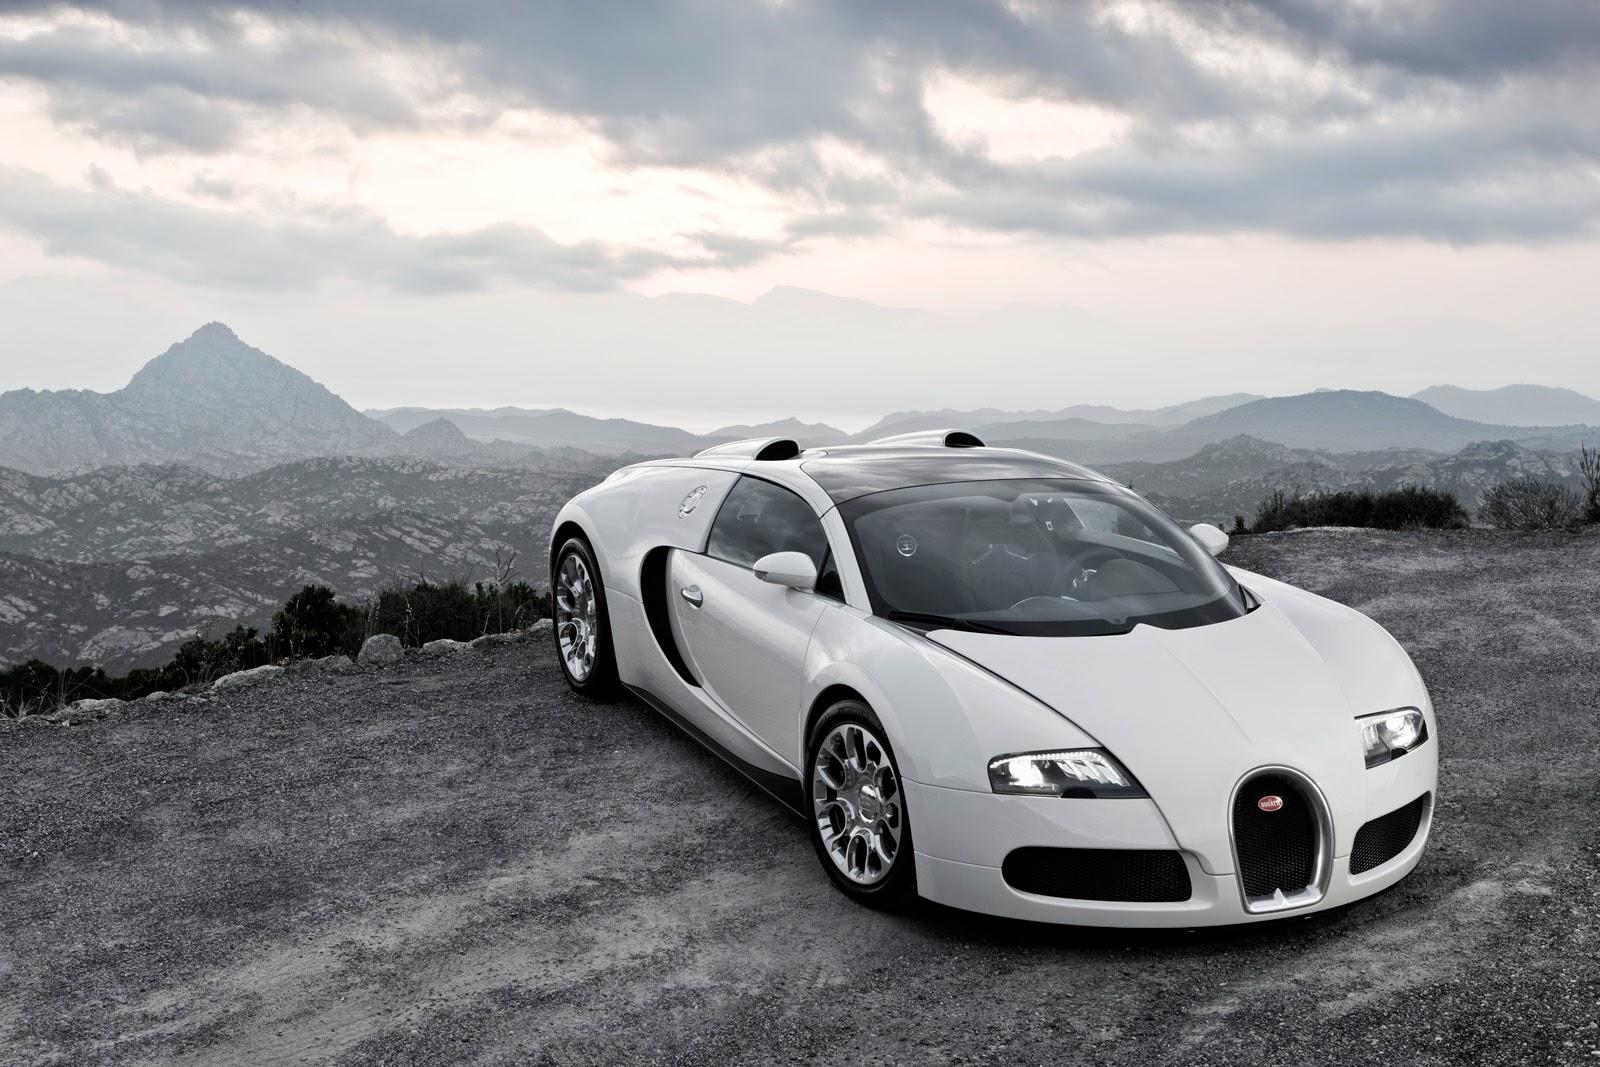 "<img src=""http://4.bp.blogspot.com/-qDxkeCisBeQ/U5Sin3_P3kI/AAAAAAAAALM/bcYVkaK0EoA/s1600/bugatti_veyron.jpg"" alt=""Most Expensive Cars in the World"" />"